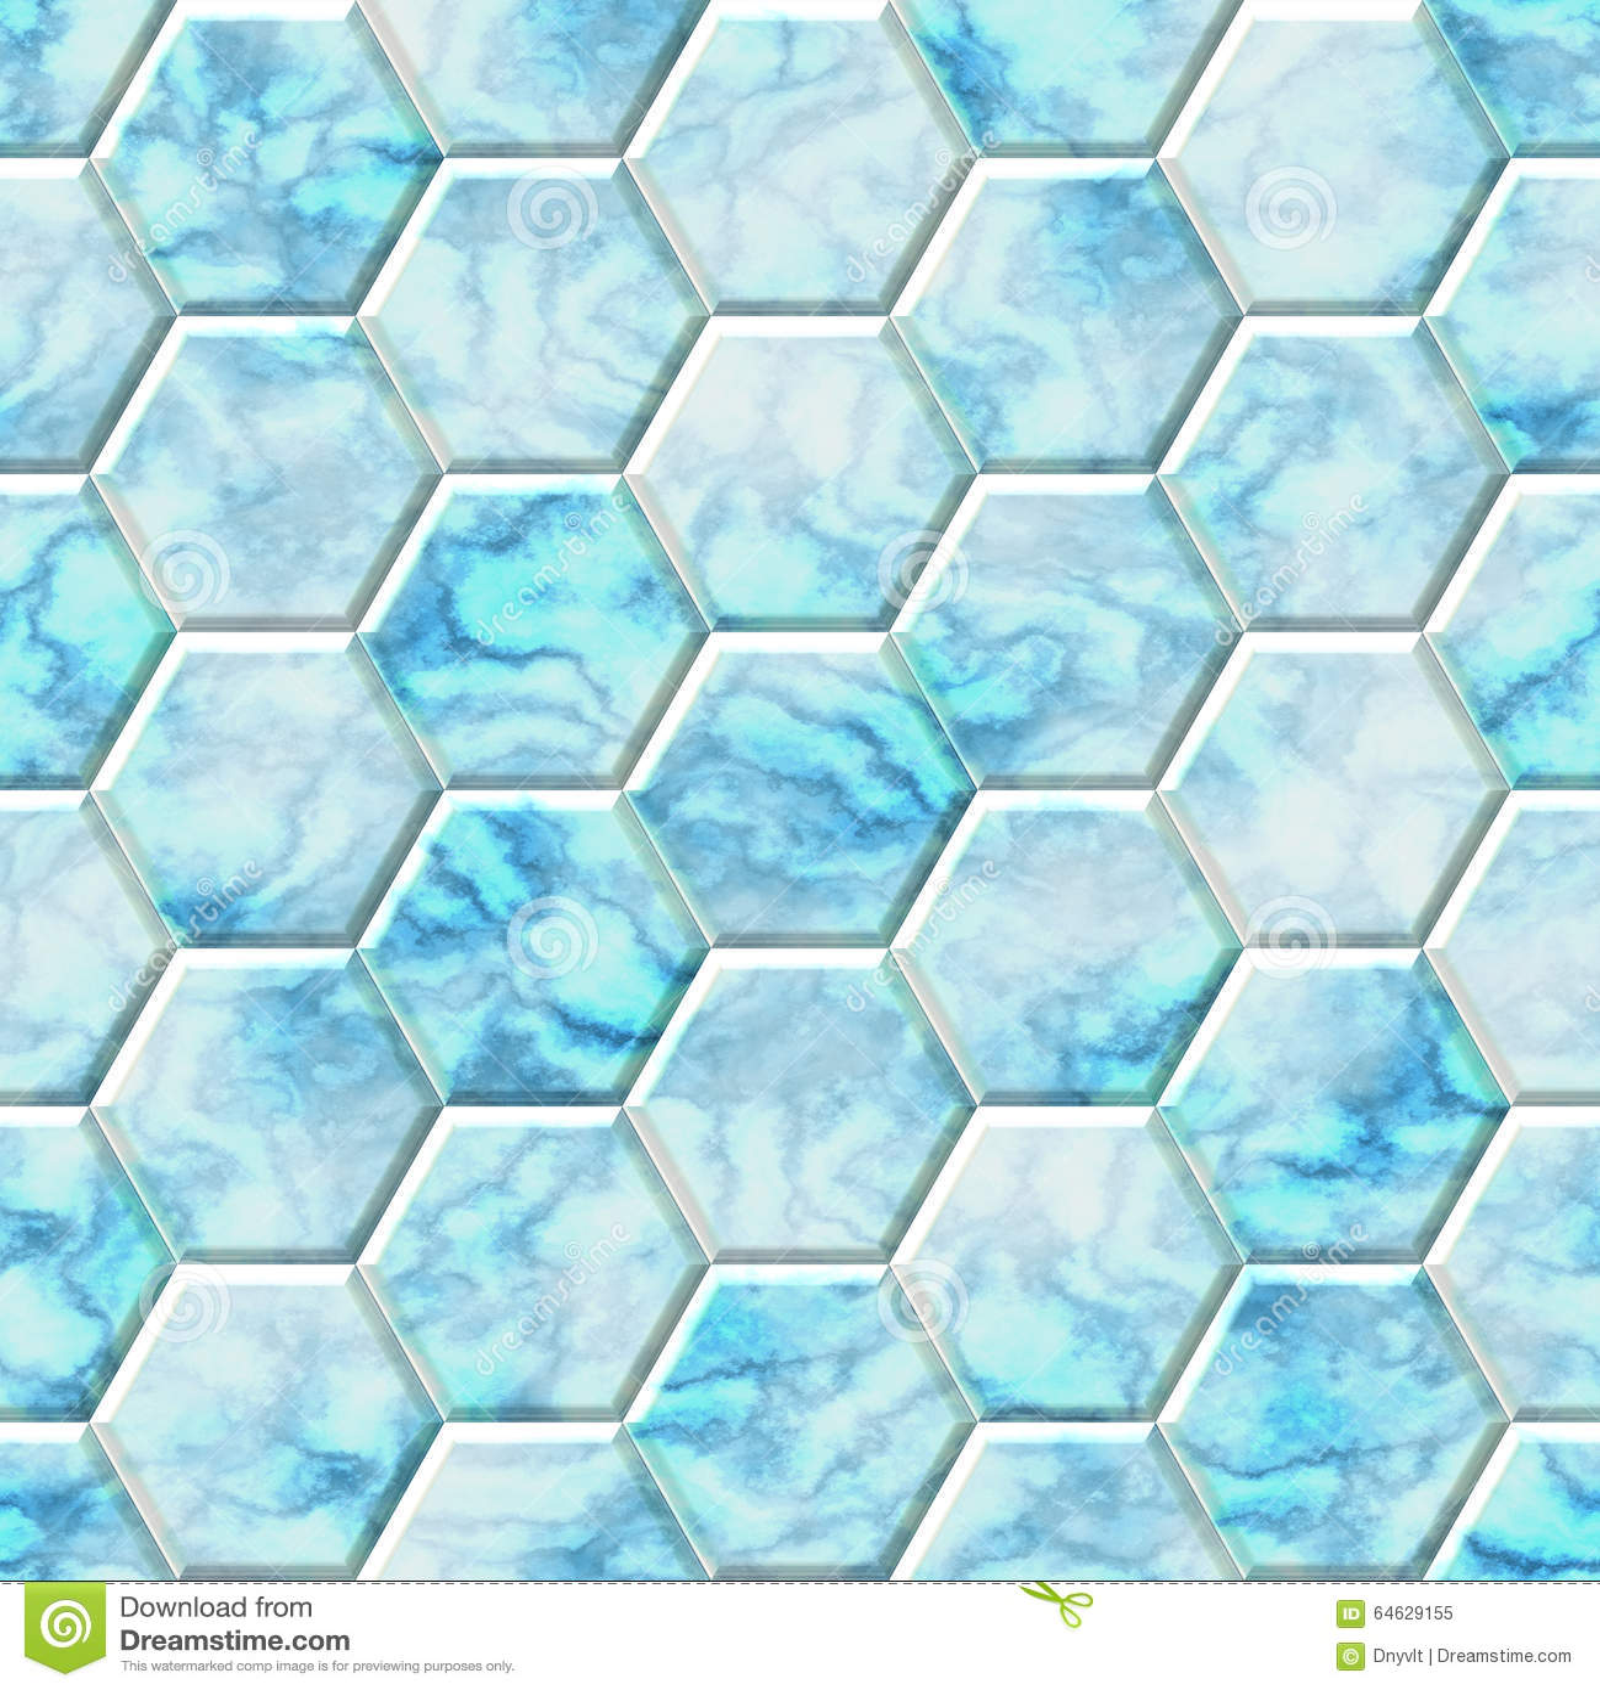 marble - blue  white